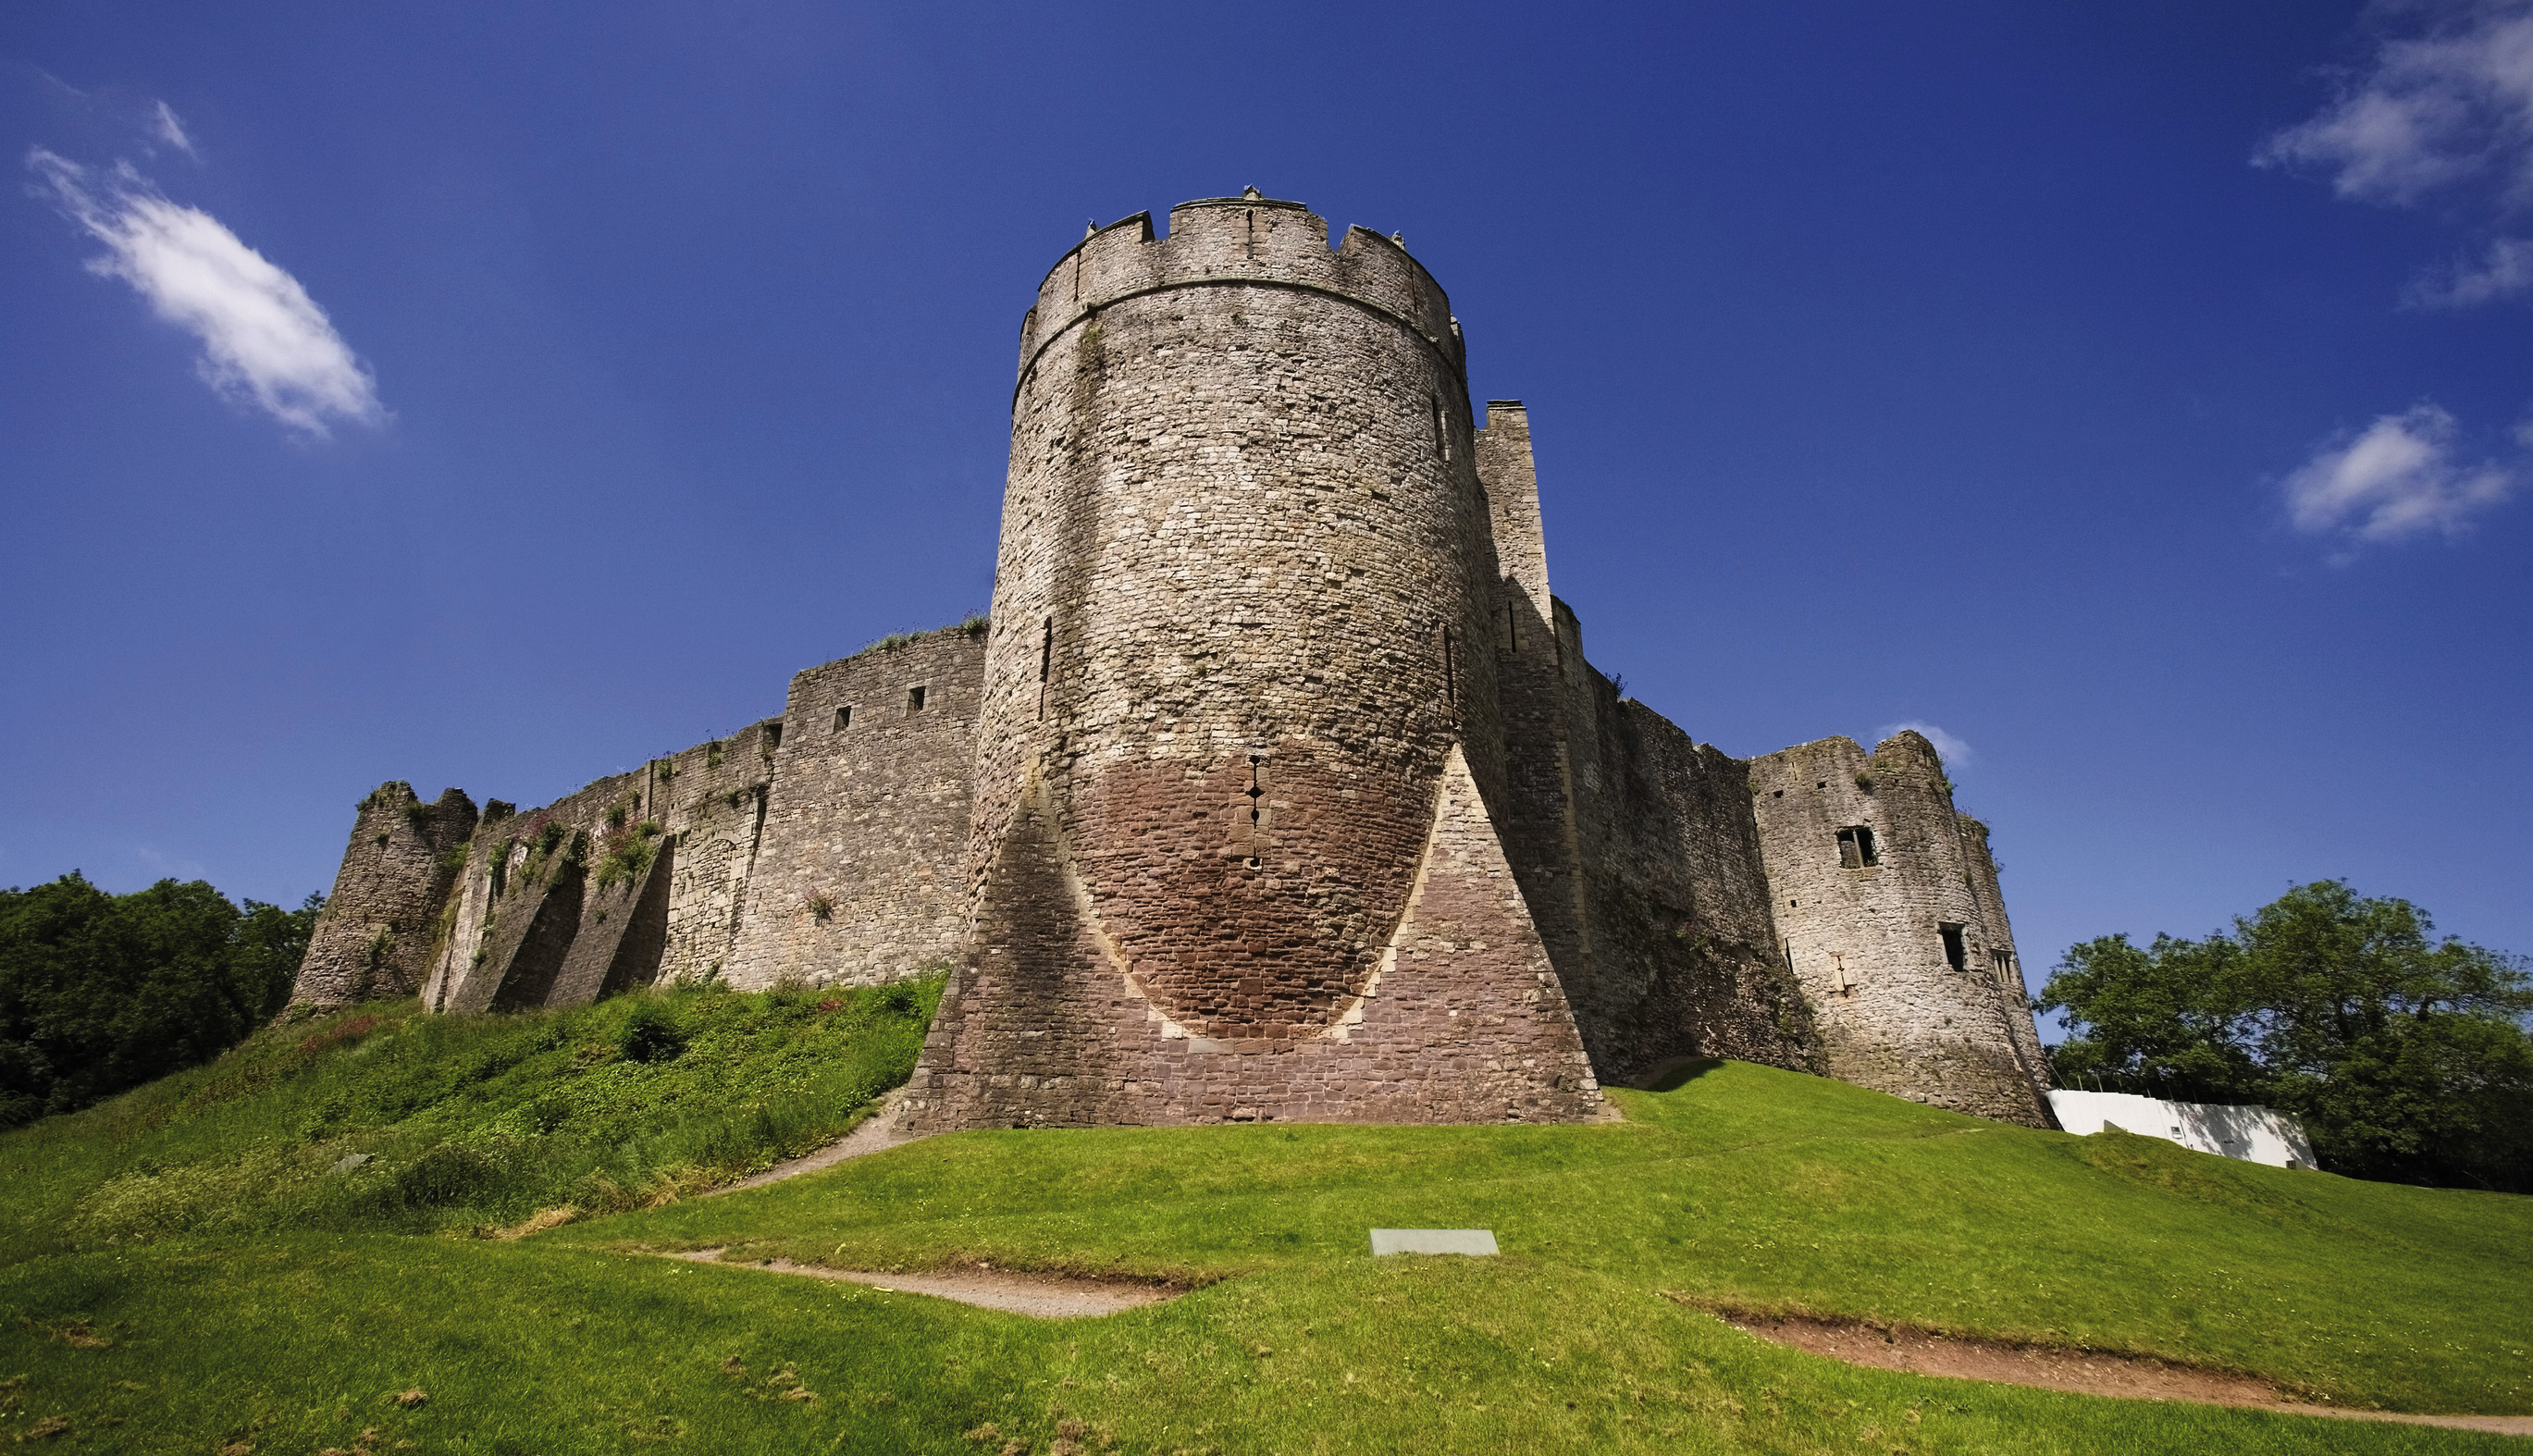 Chepstow Castle on Offa's Dyke Path